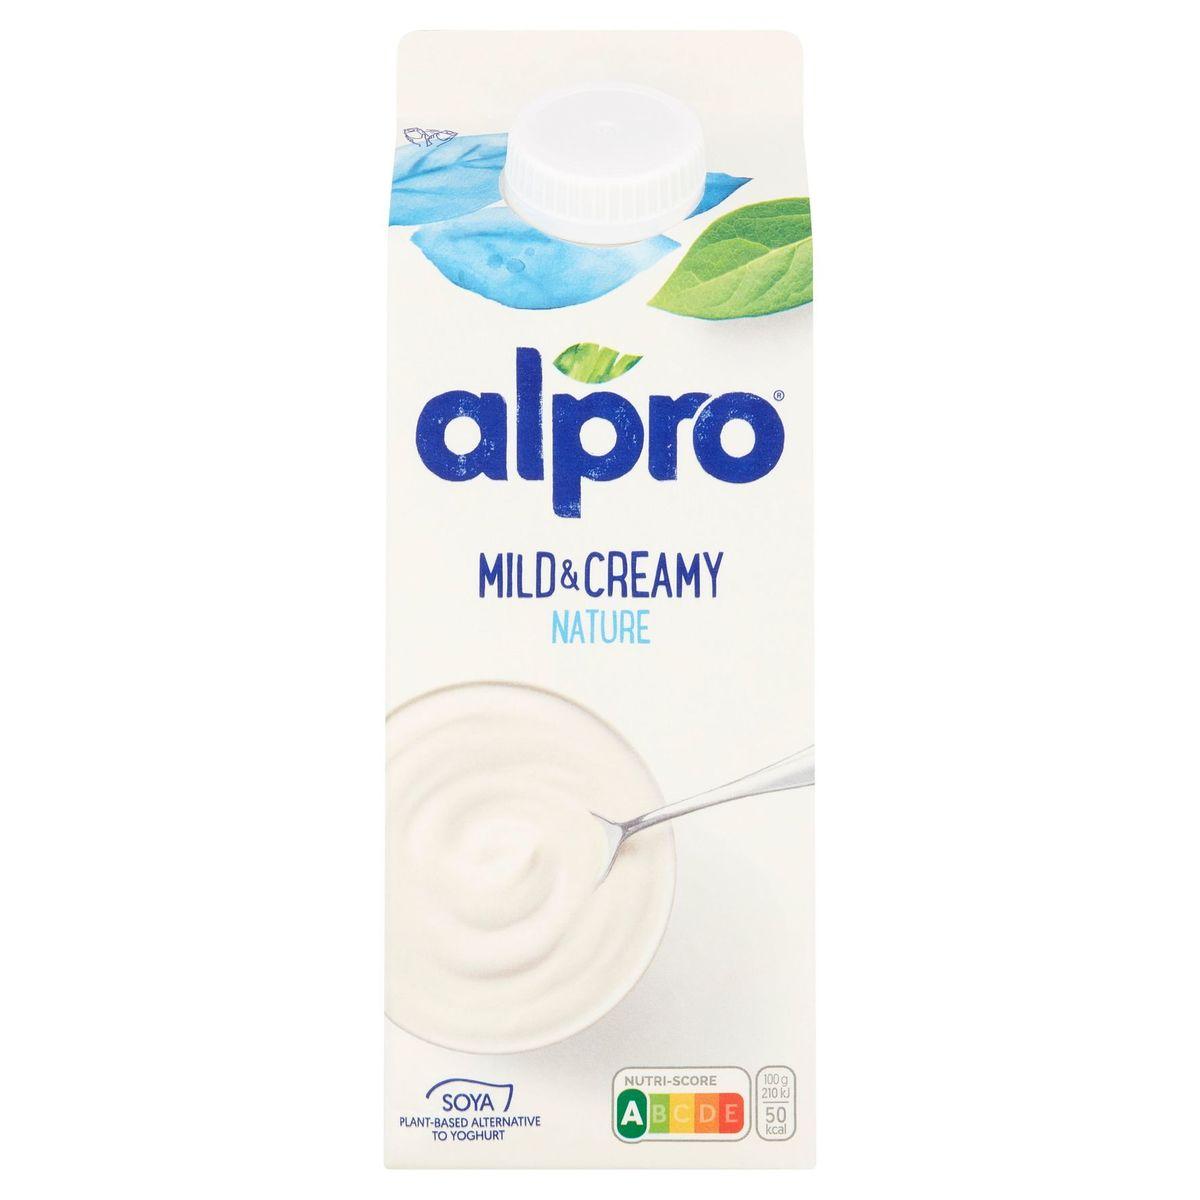 Alpro Soya Mild & Creamy Nature 750 g